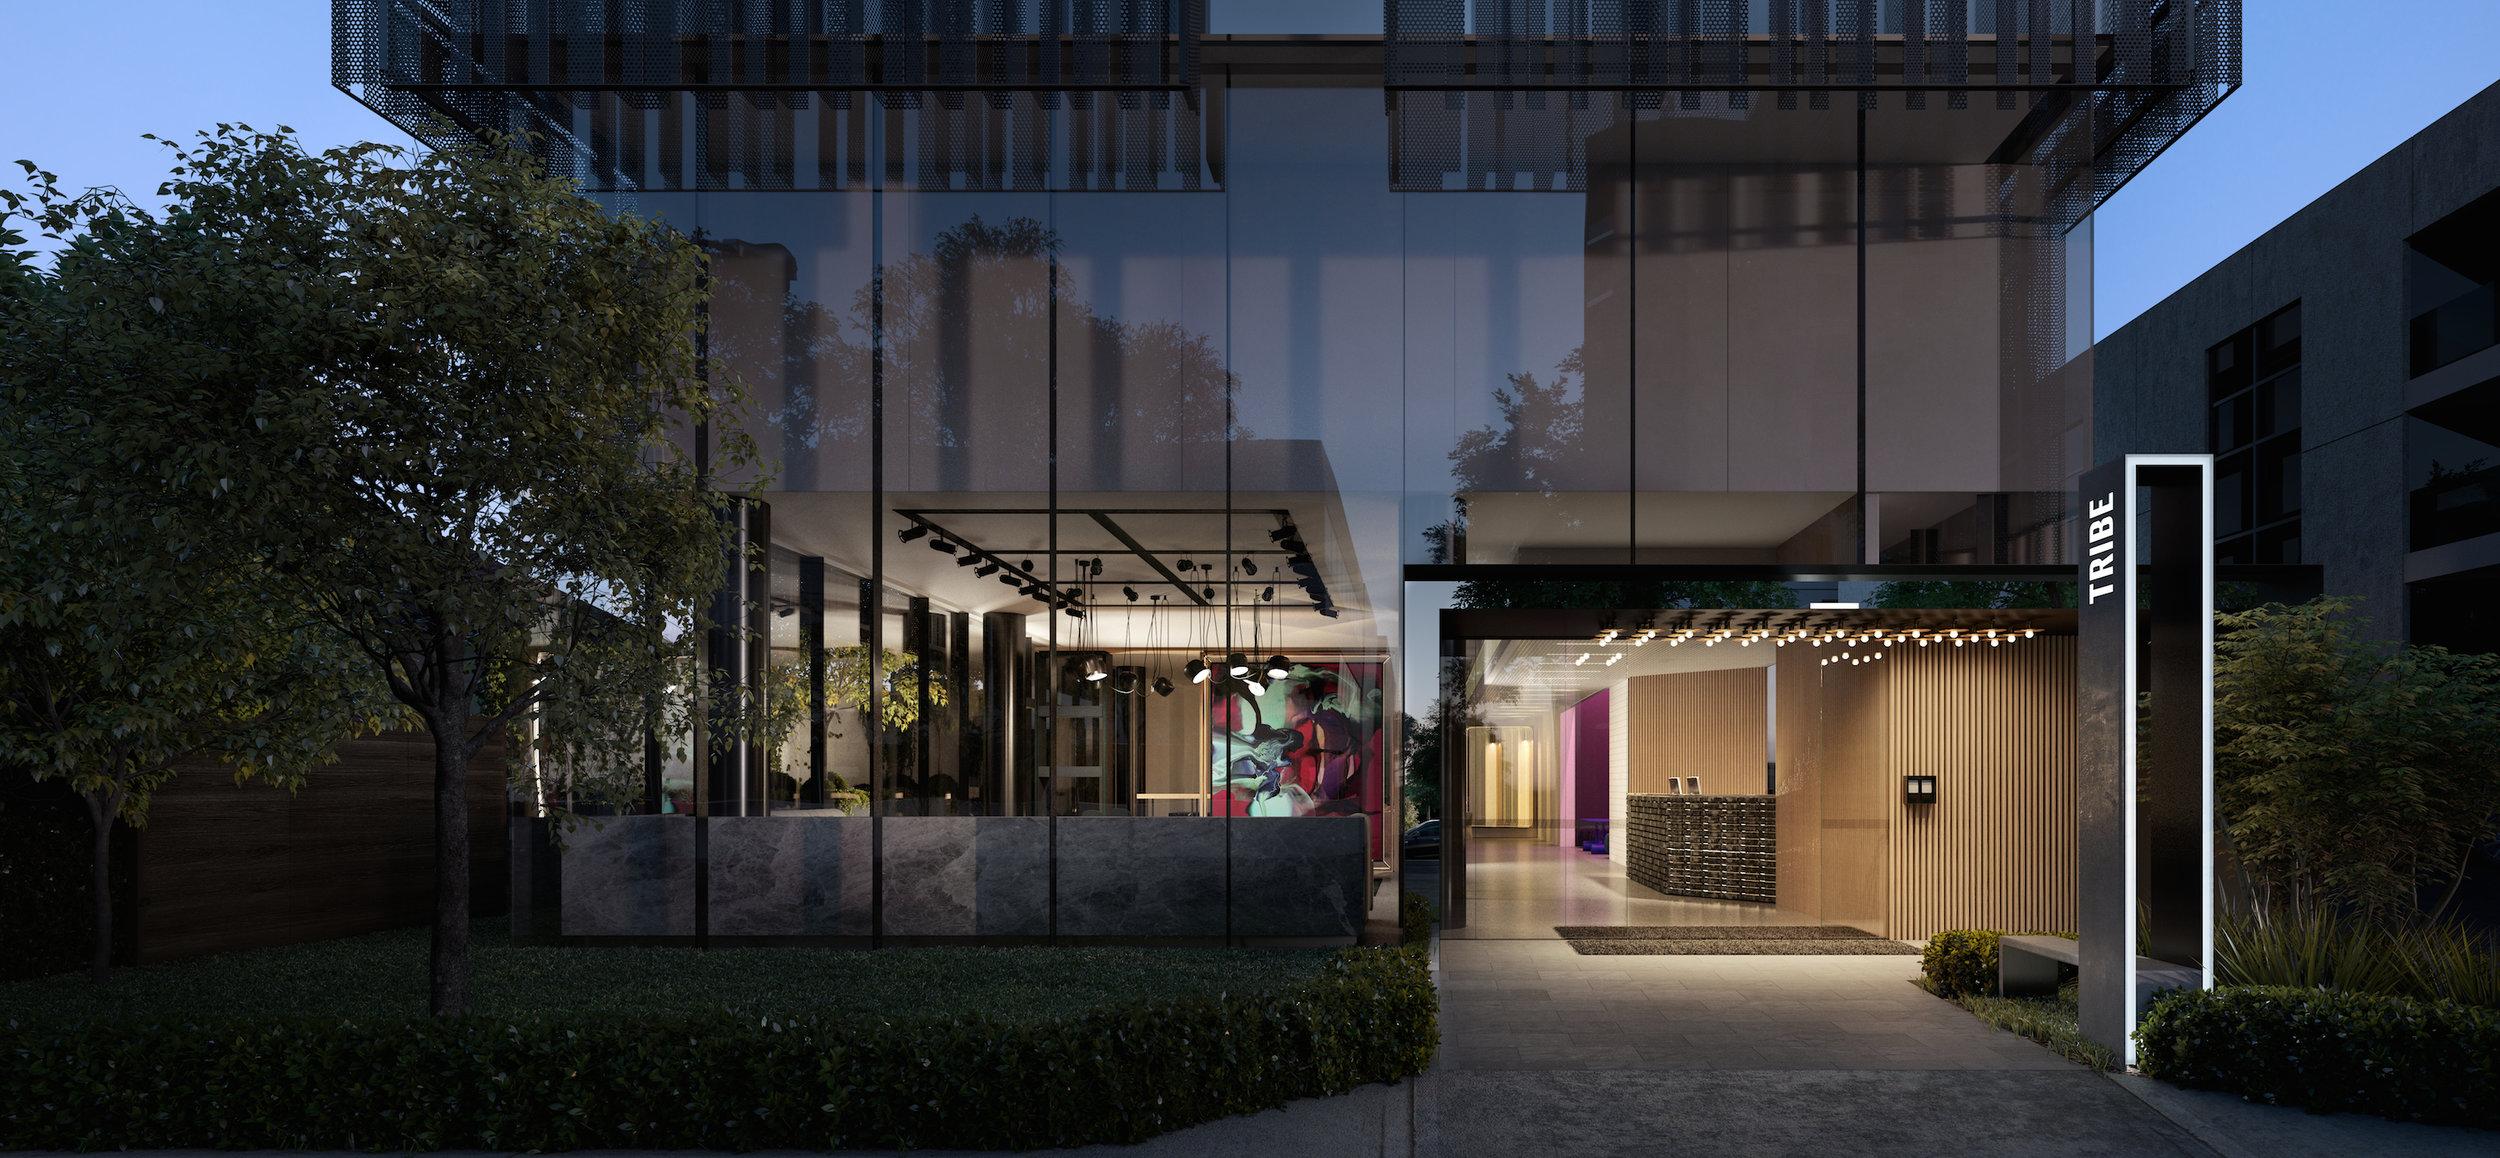 TravMedia_Australia_1212406_1630_21 19 Perth Hotel - External_Entry_REVA.jpg